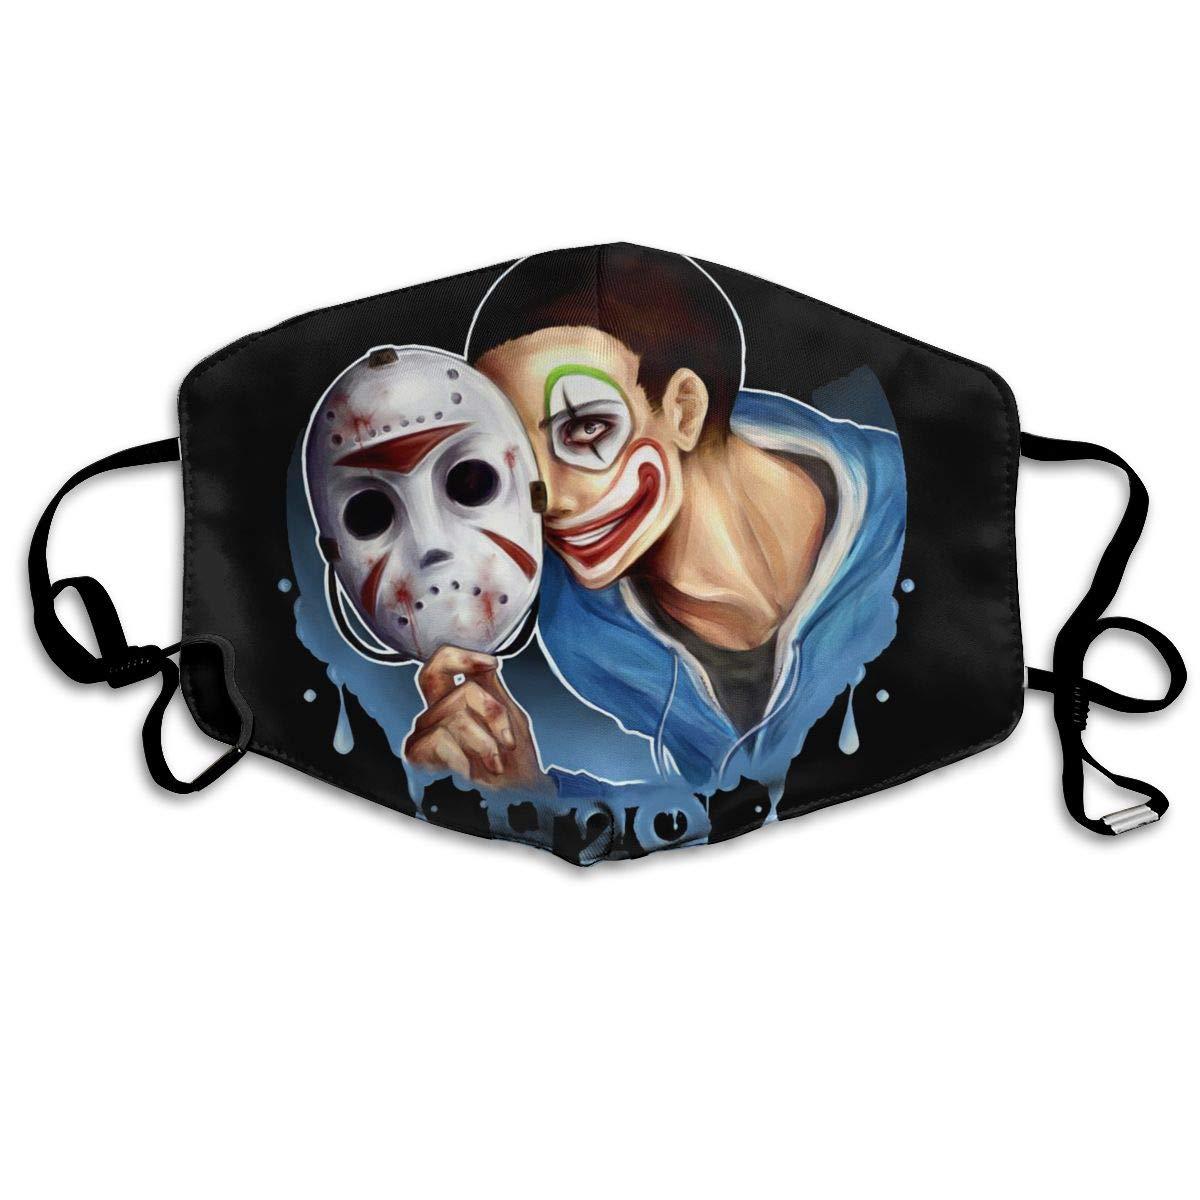 Amazon com: Simoner Anti Dust Mask Best-H2O-Delirious Anti Pollution